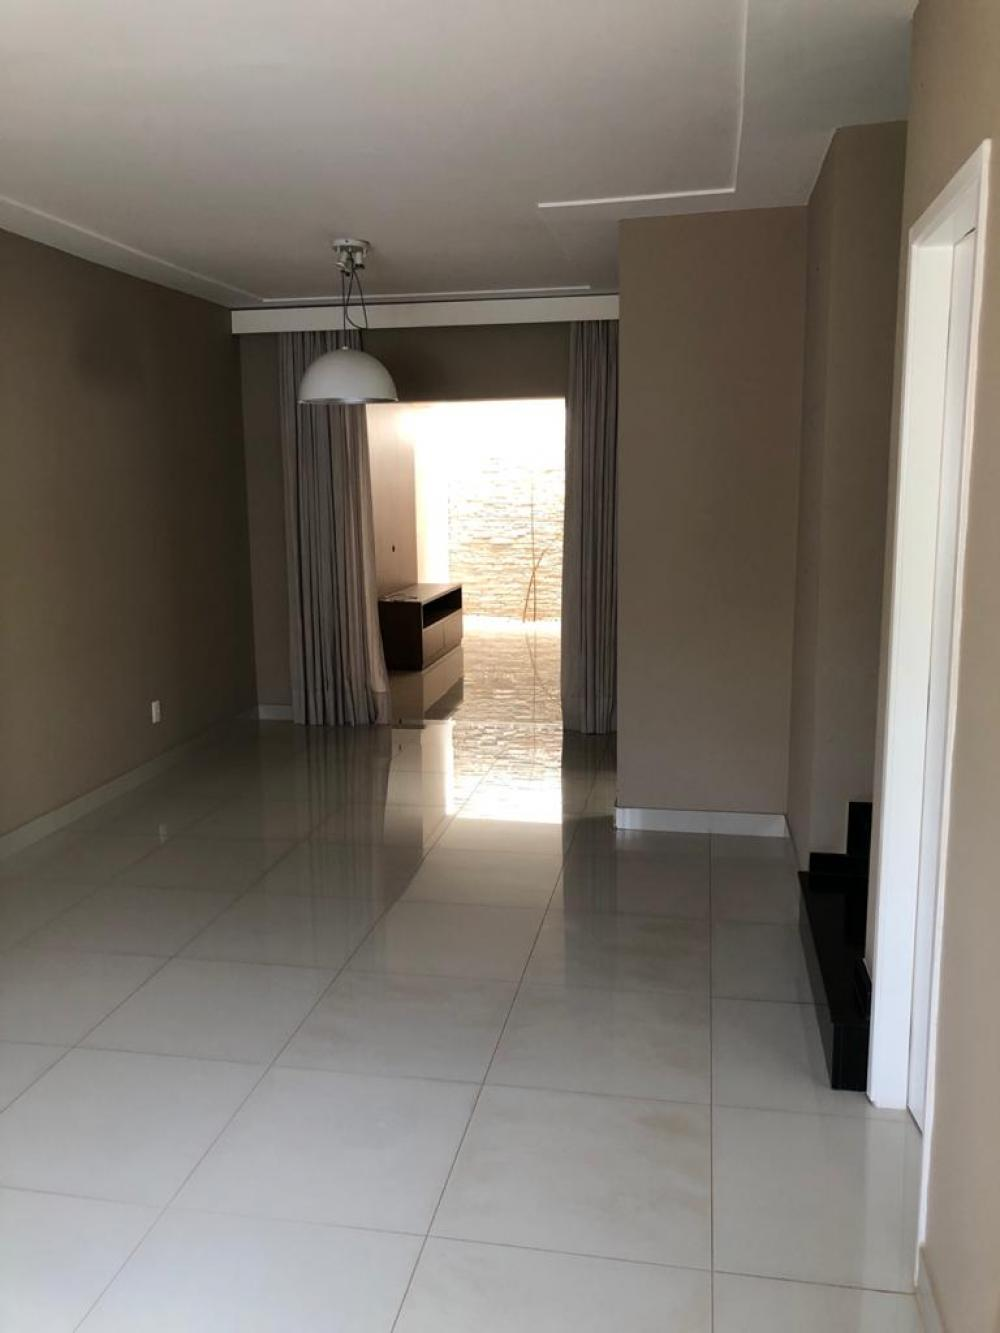 Sao Jose do Rio Preto Casa Venda R$550.000,00 Condominio R$330,00 3 Dormitorios 2 Vagas Area do terreno 150.00m2 Area construida 95.00m2